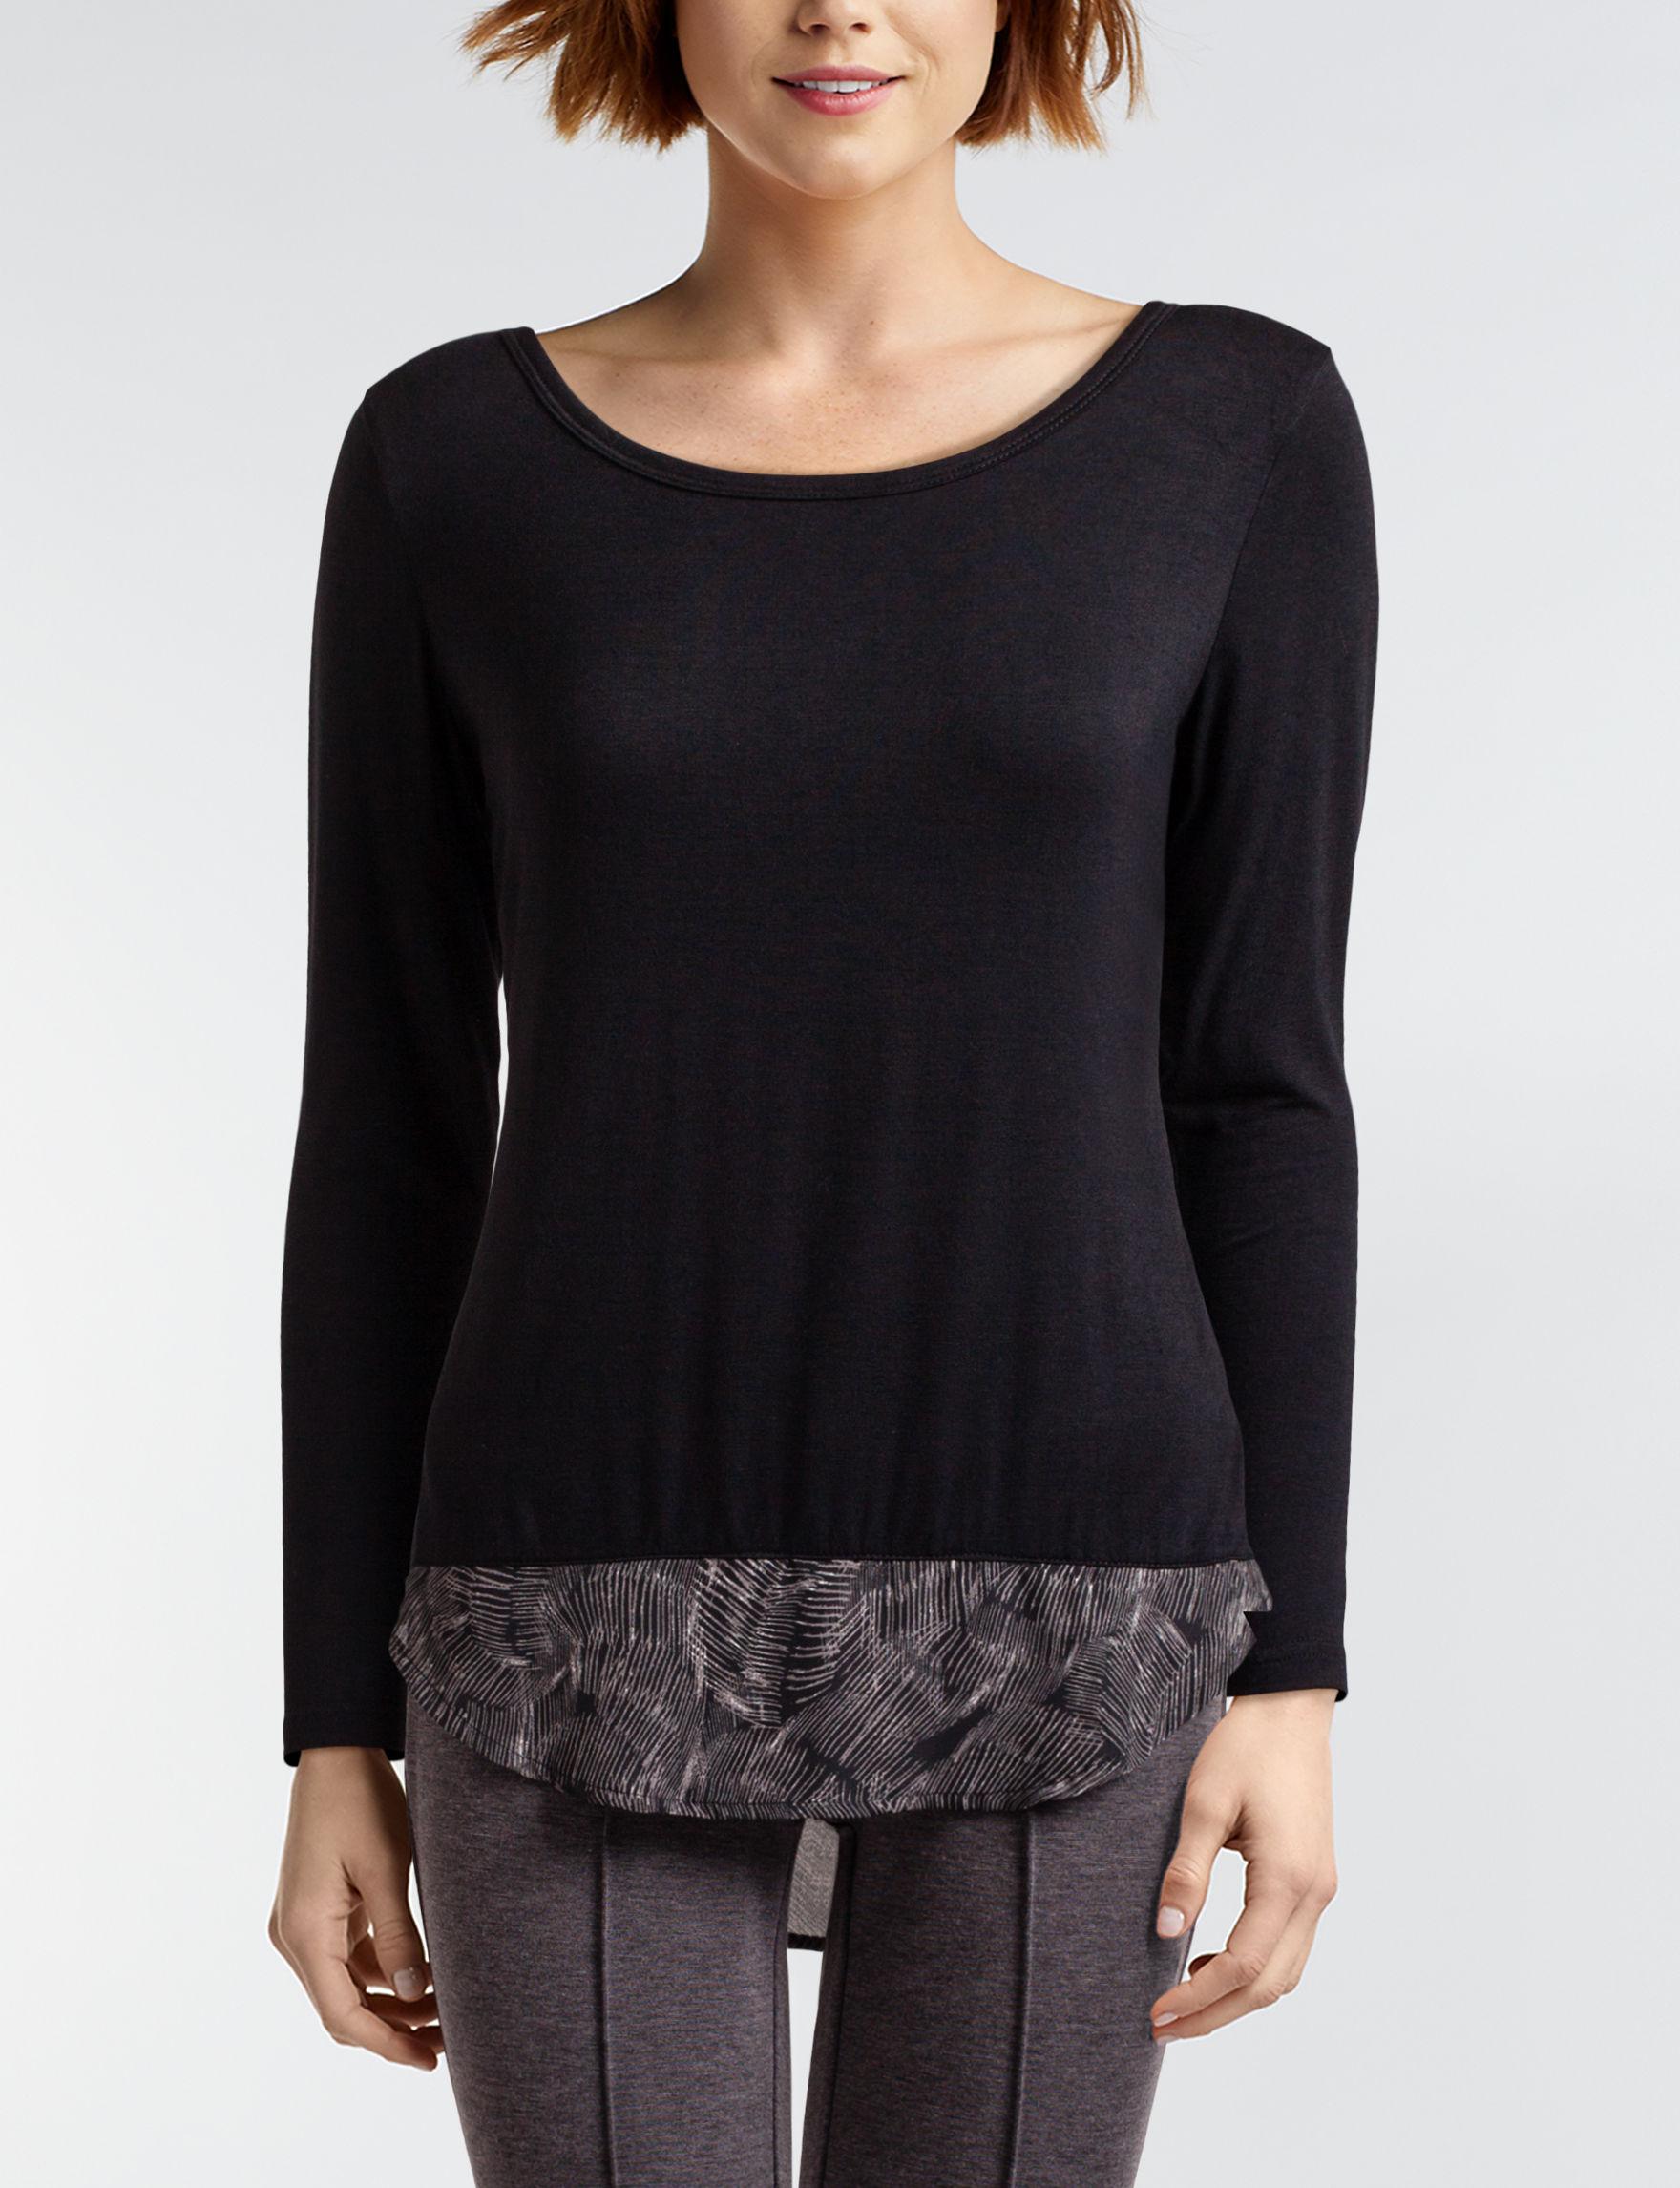 Daisy Fuentes Black Shirts & Blouses